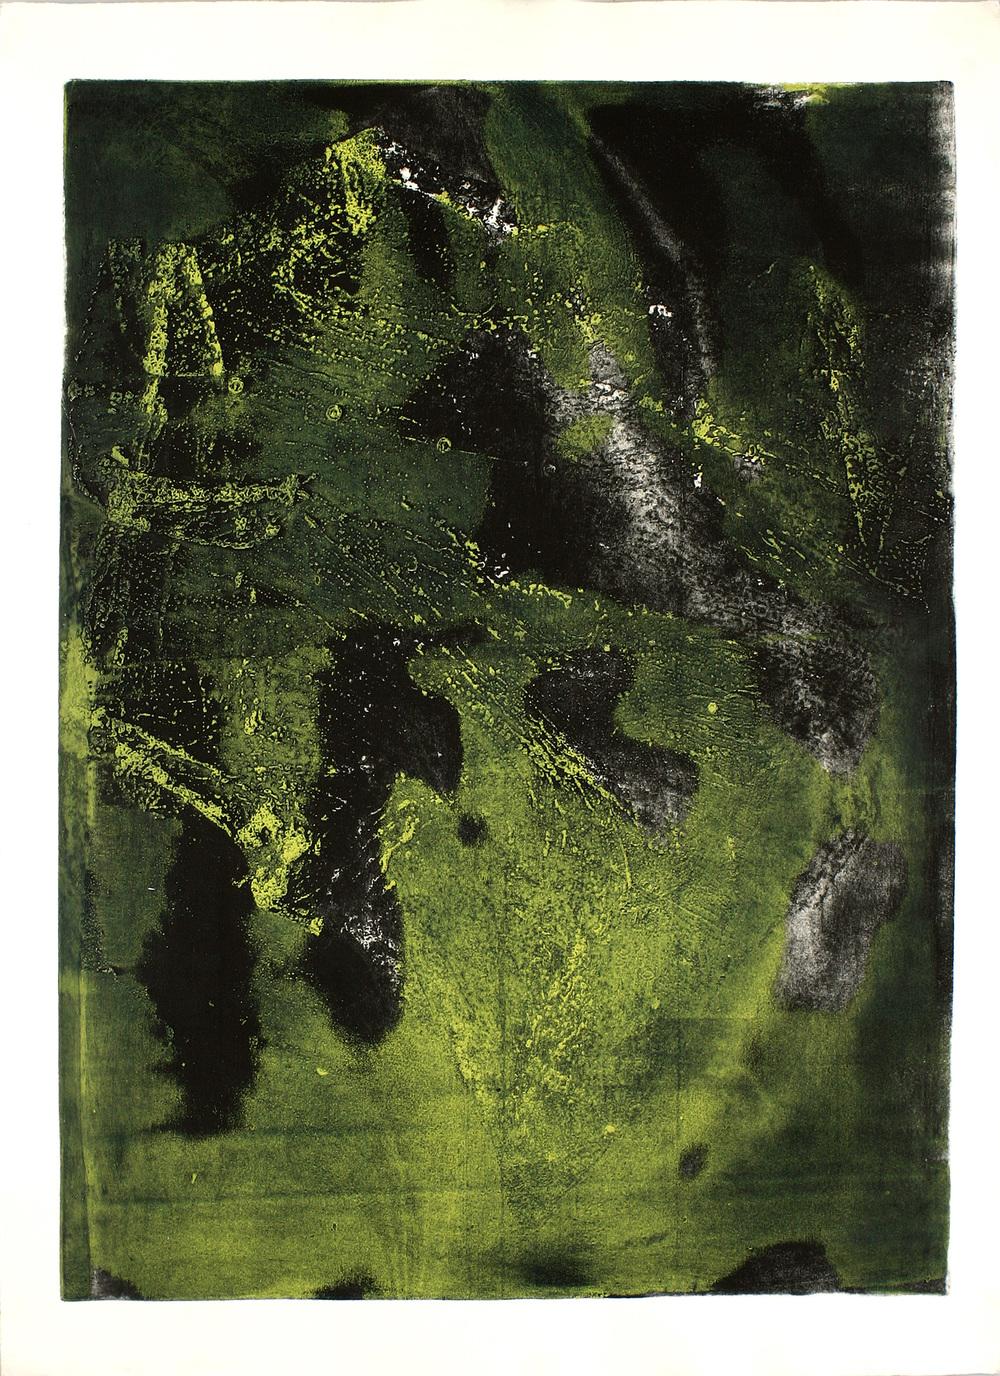 Cartografia ,2006 Controstampa, acquaforte su zinco,monoprint 80x60.jpg